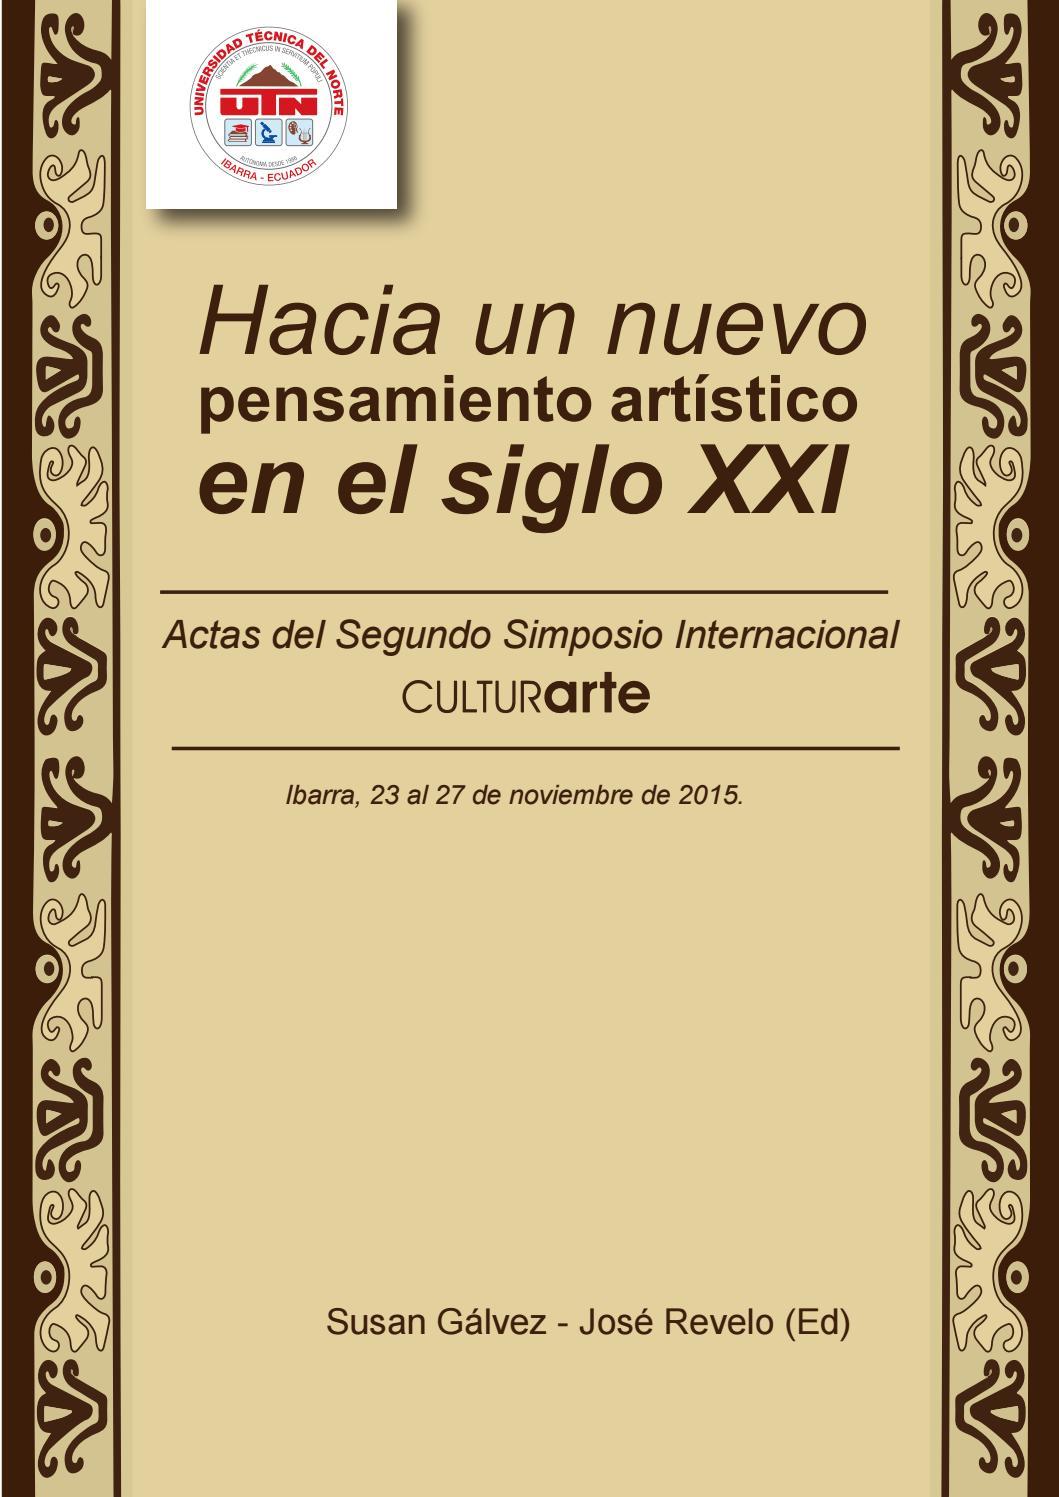 6b84fb4dc II Simposio Interncacional CulturArte by Editorial Universidad Técnica del  Norte UTN - issuu